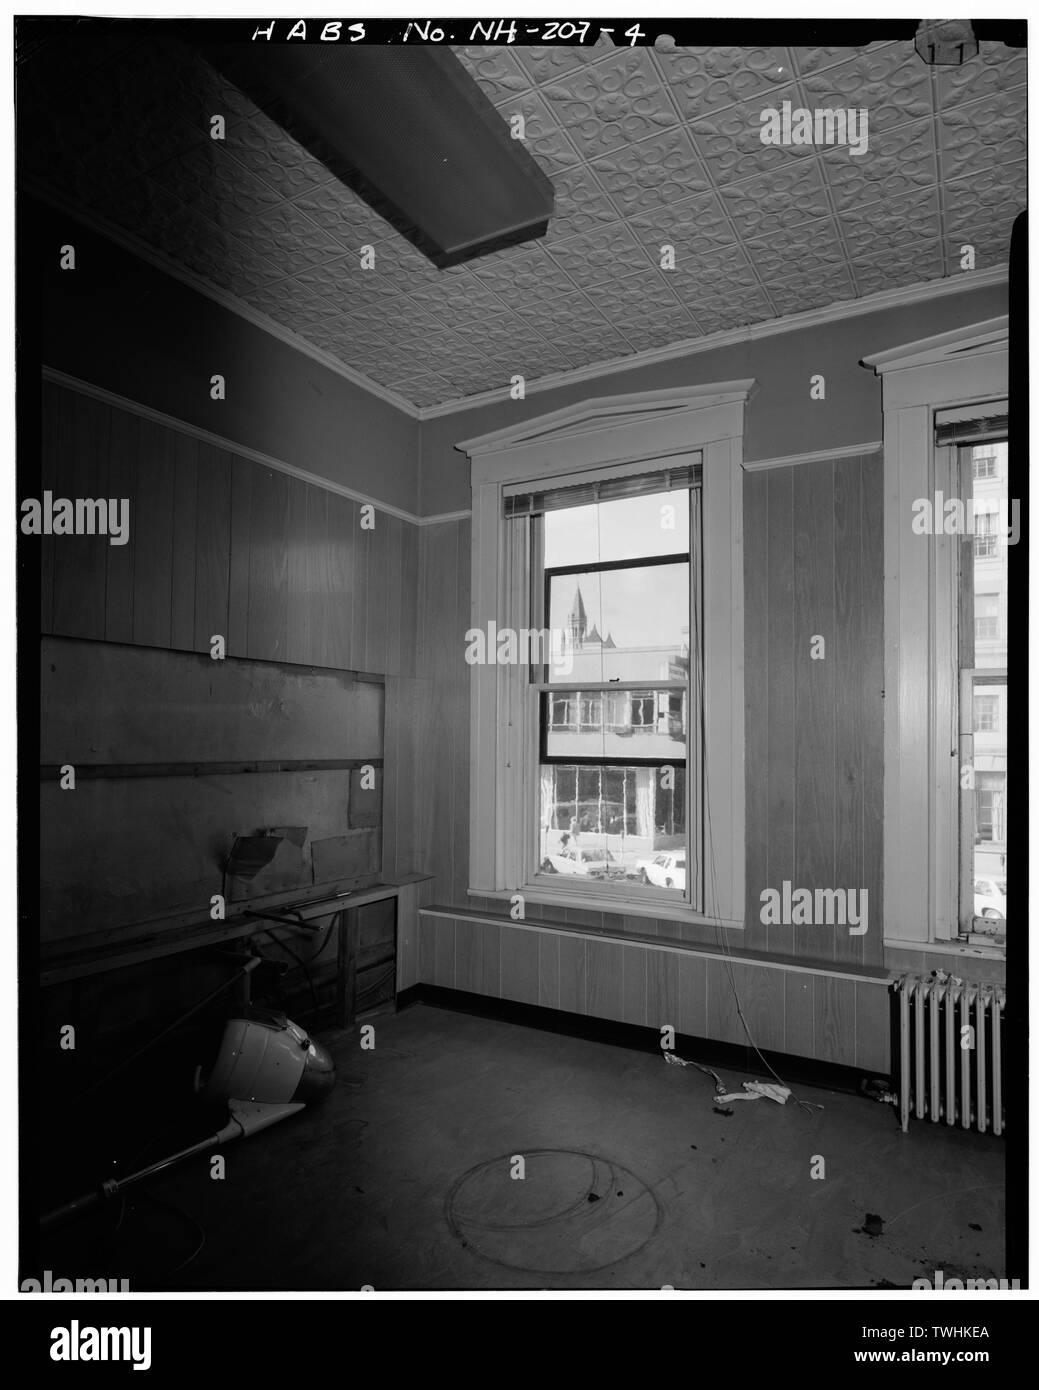 SECOND FLOOR, SOUTHWEST OFFICE, LOOKING WEST - Merchants' Exchange Block, 94-102 North Main Street, Concord, Merrimack County, NH - Stock Image